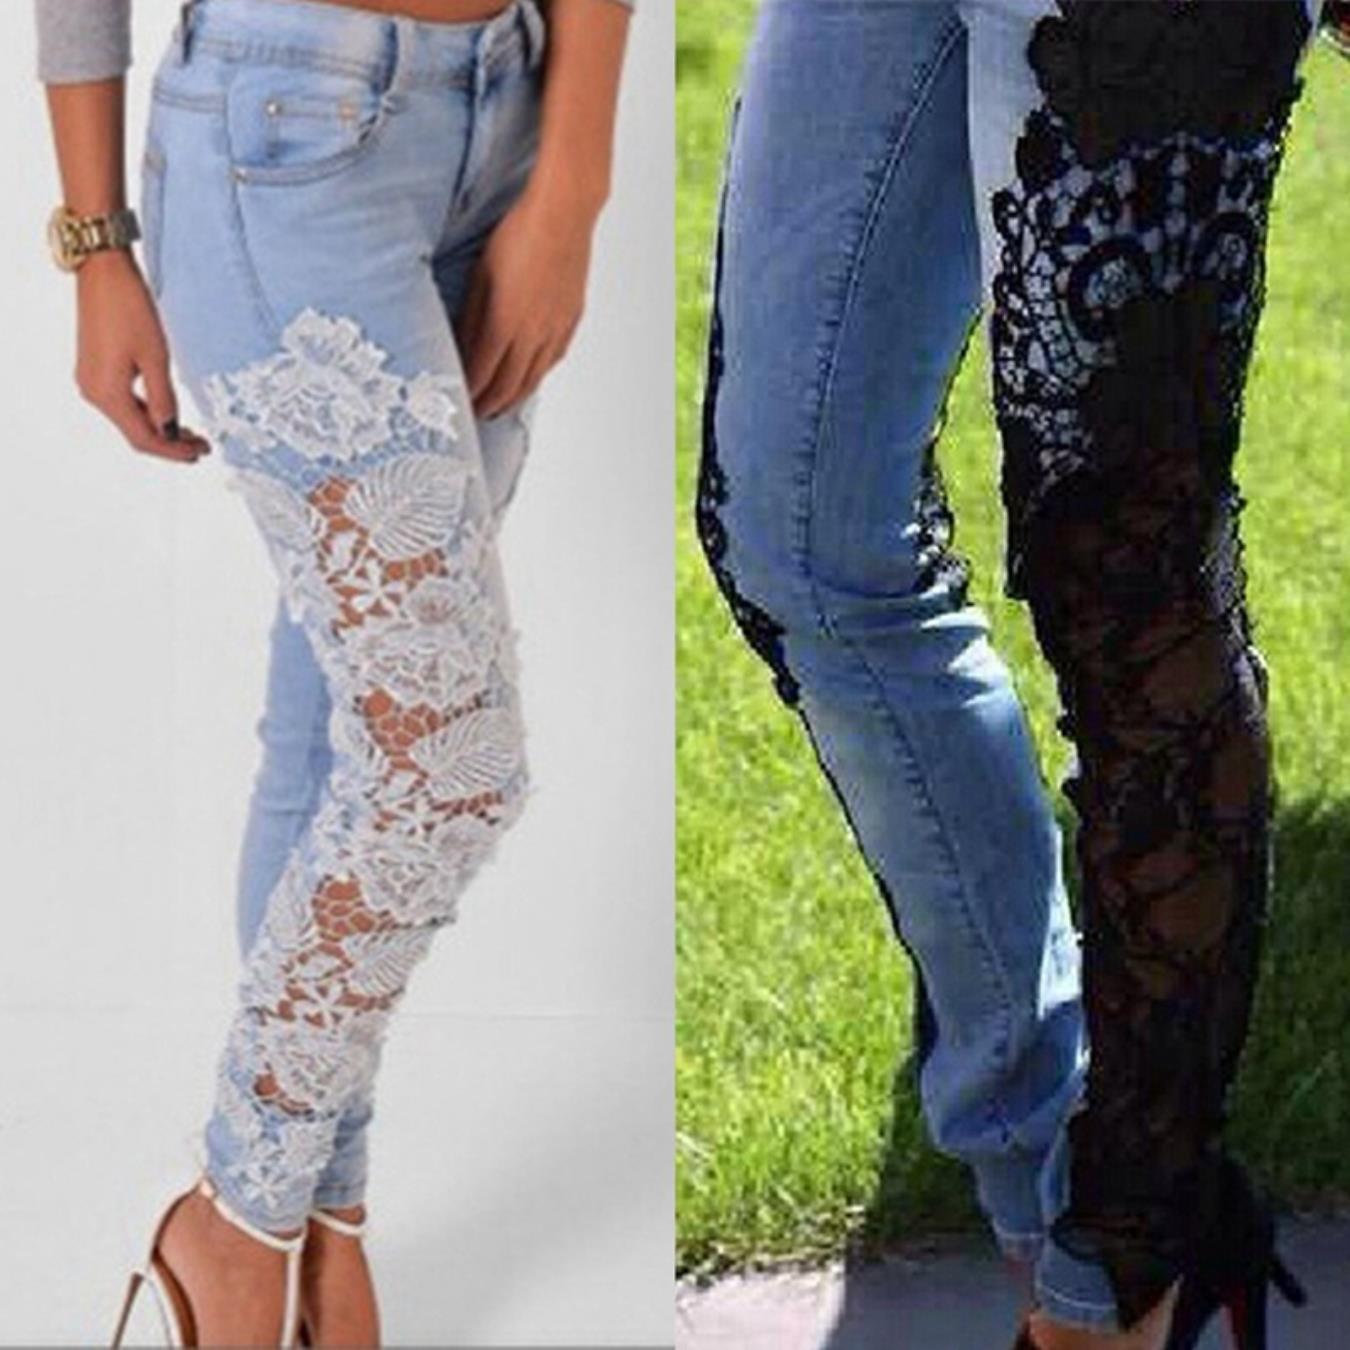 meiqineight Women Lace Patchwork Low Waist Skinny Slim Denim Elastic Pants Jeans